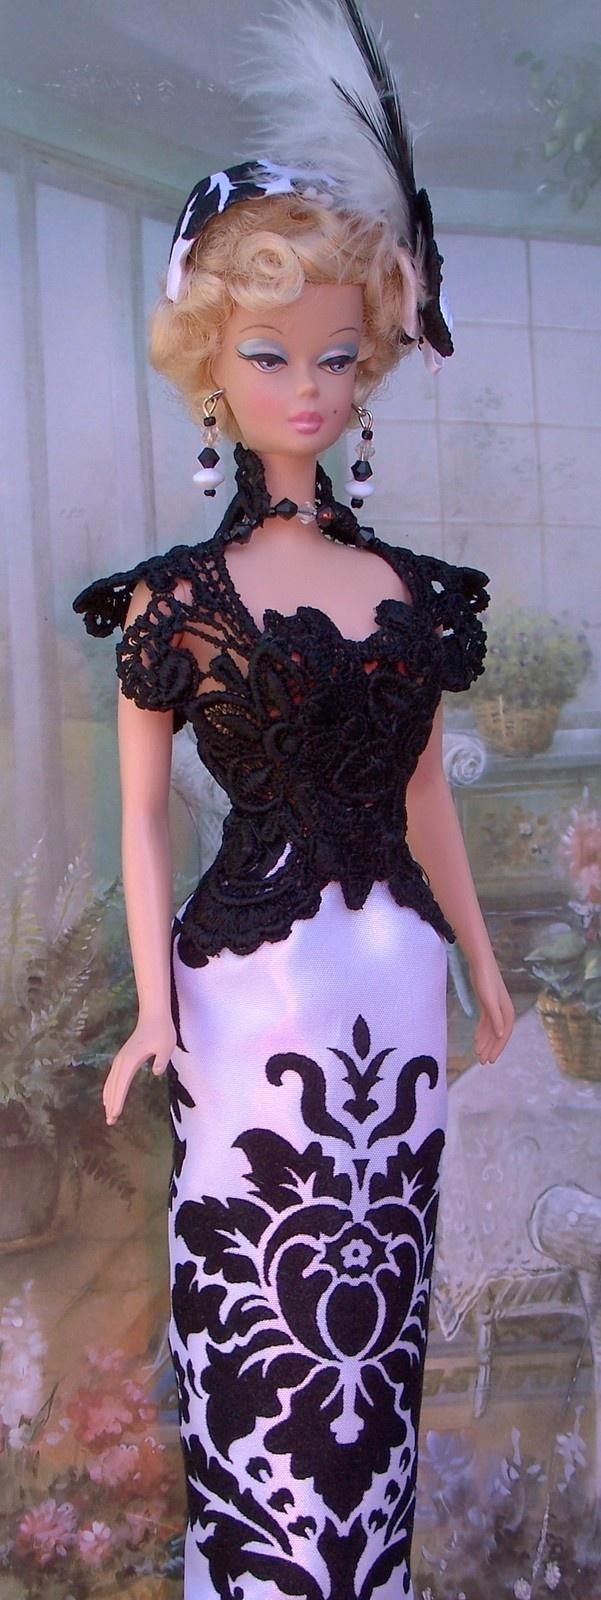 BlackWhite Damaskvelvet Applique OOAK Fashion Fit Royalty FR2 Silkstone Barbies |